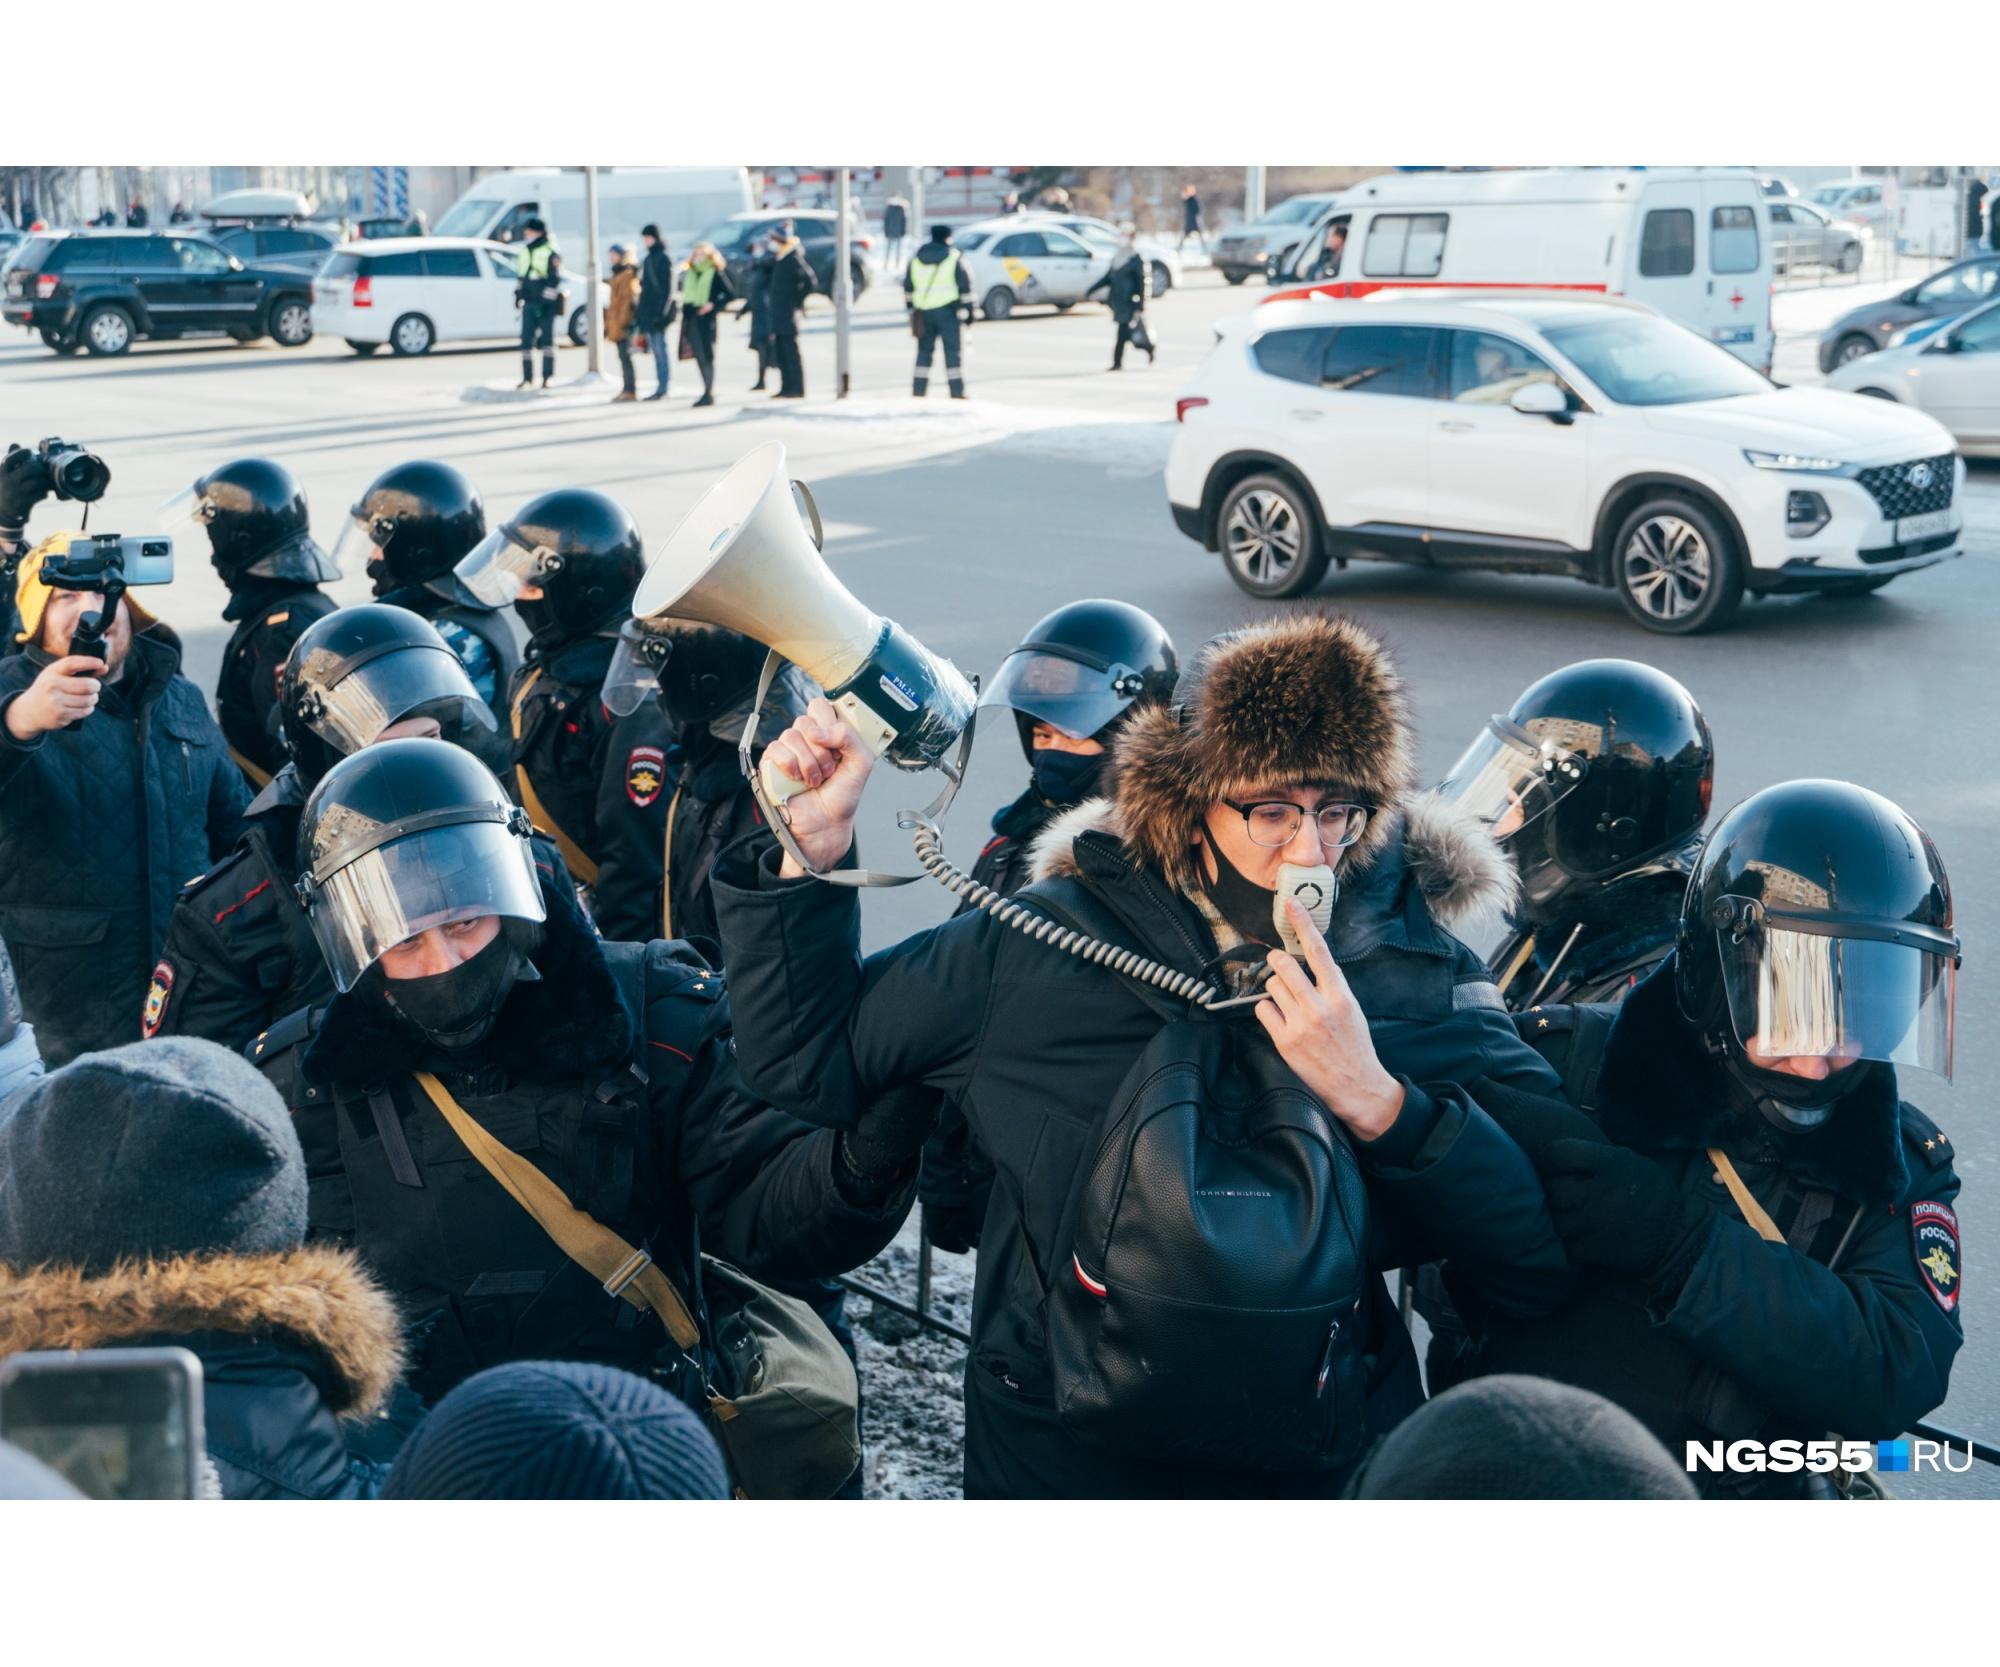 "Активиста Даниила Чебыкина <a href=""https://ngs55.ru/text/politics/2021/01/31/69739211/"" target=""_blank"" class=""_"">задержали</a> в самом начале протестной акции"